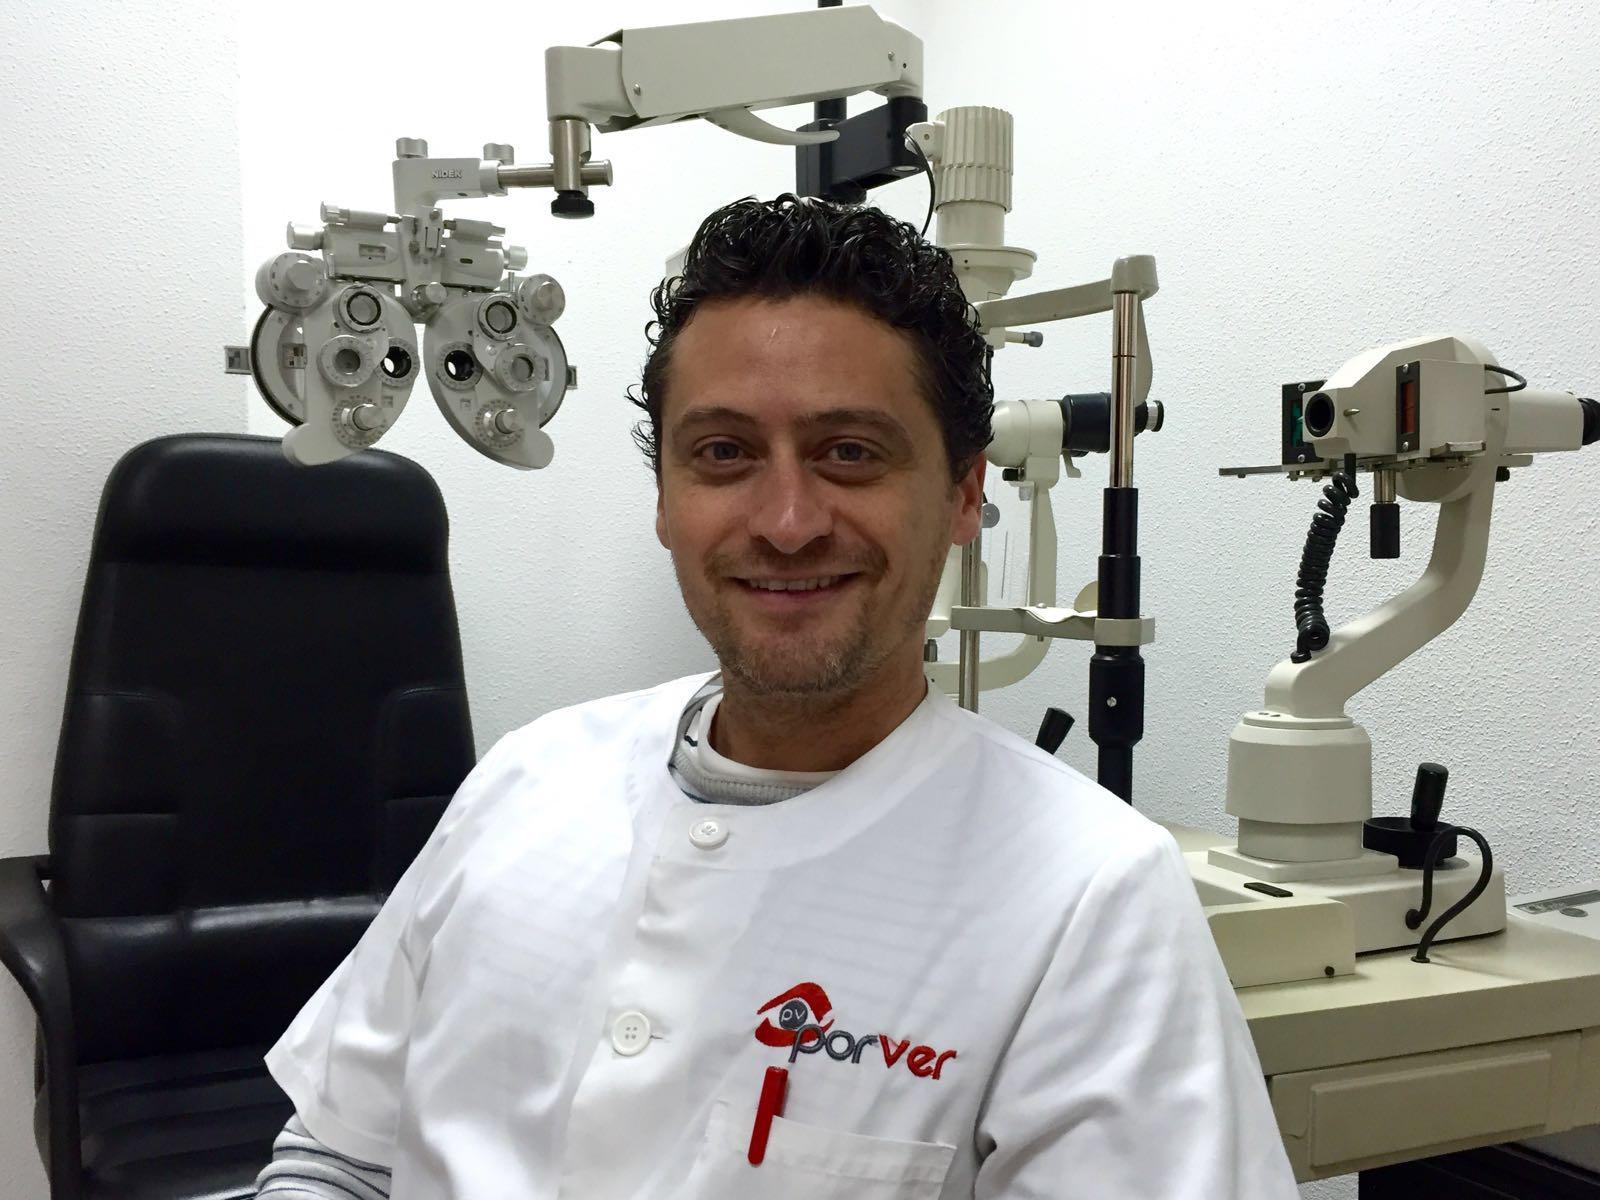 David Melian Sosa Optica Porver Noticias de San Mateo